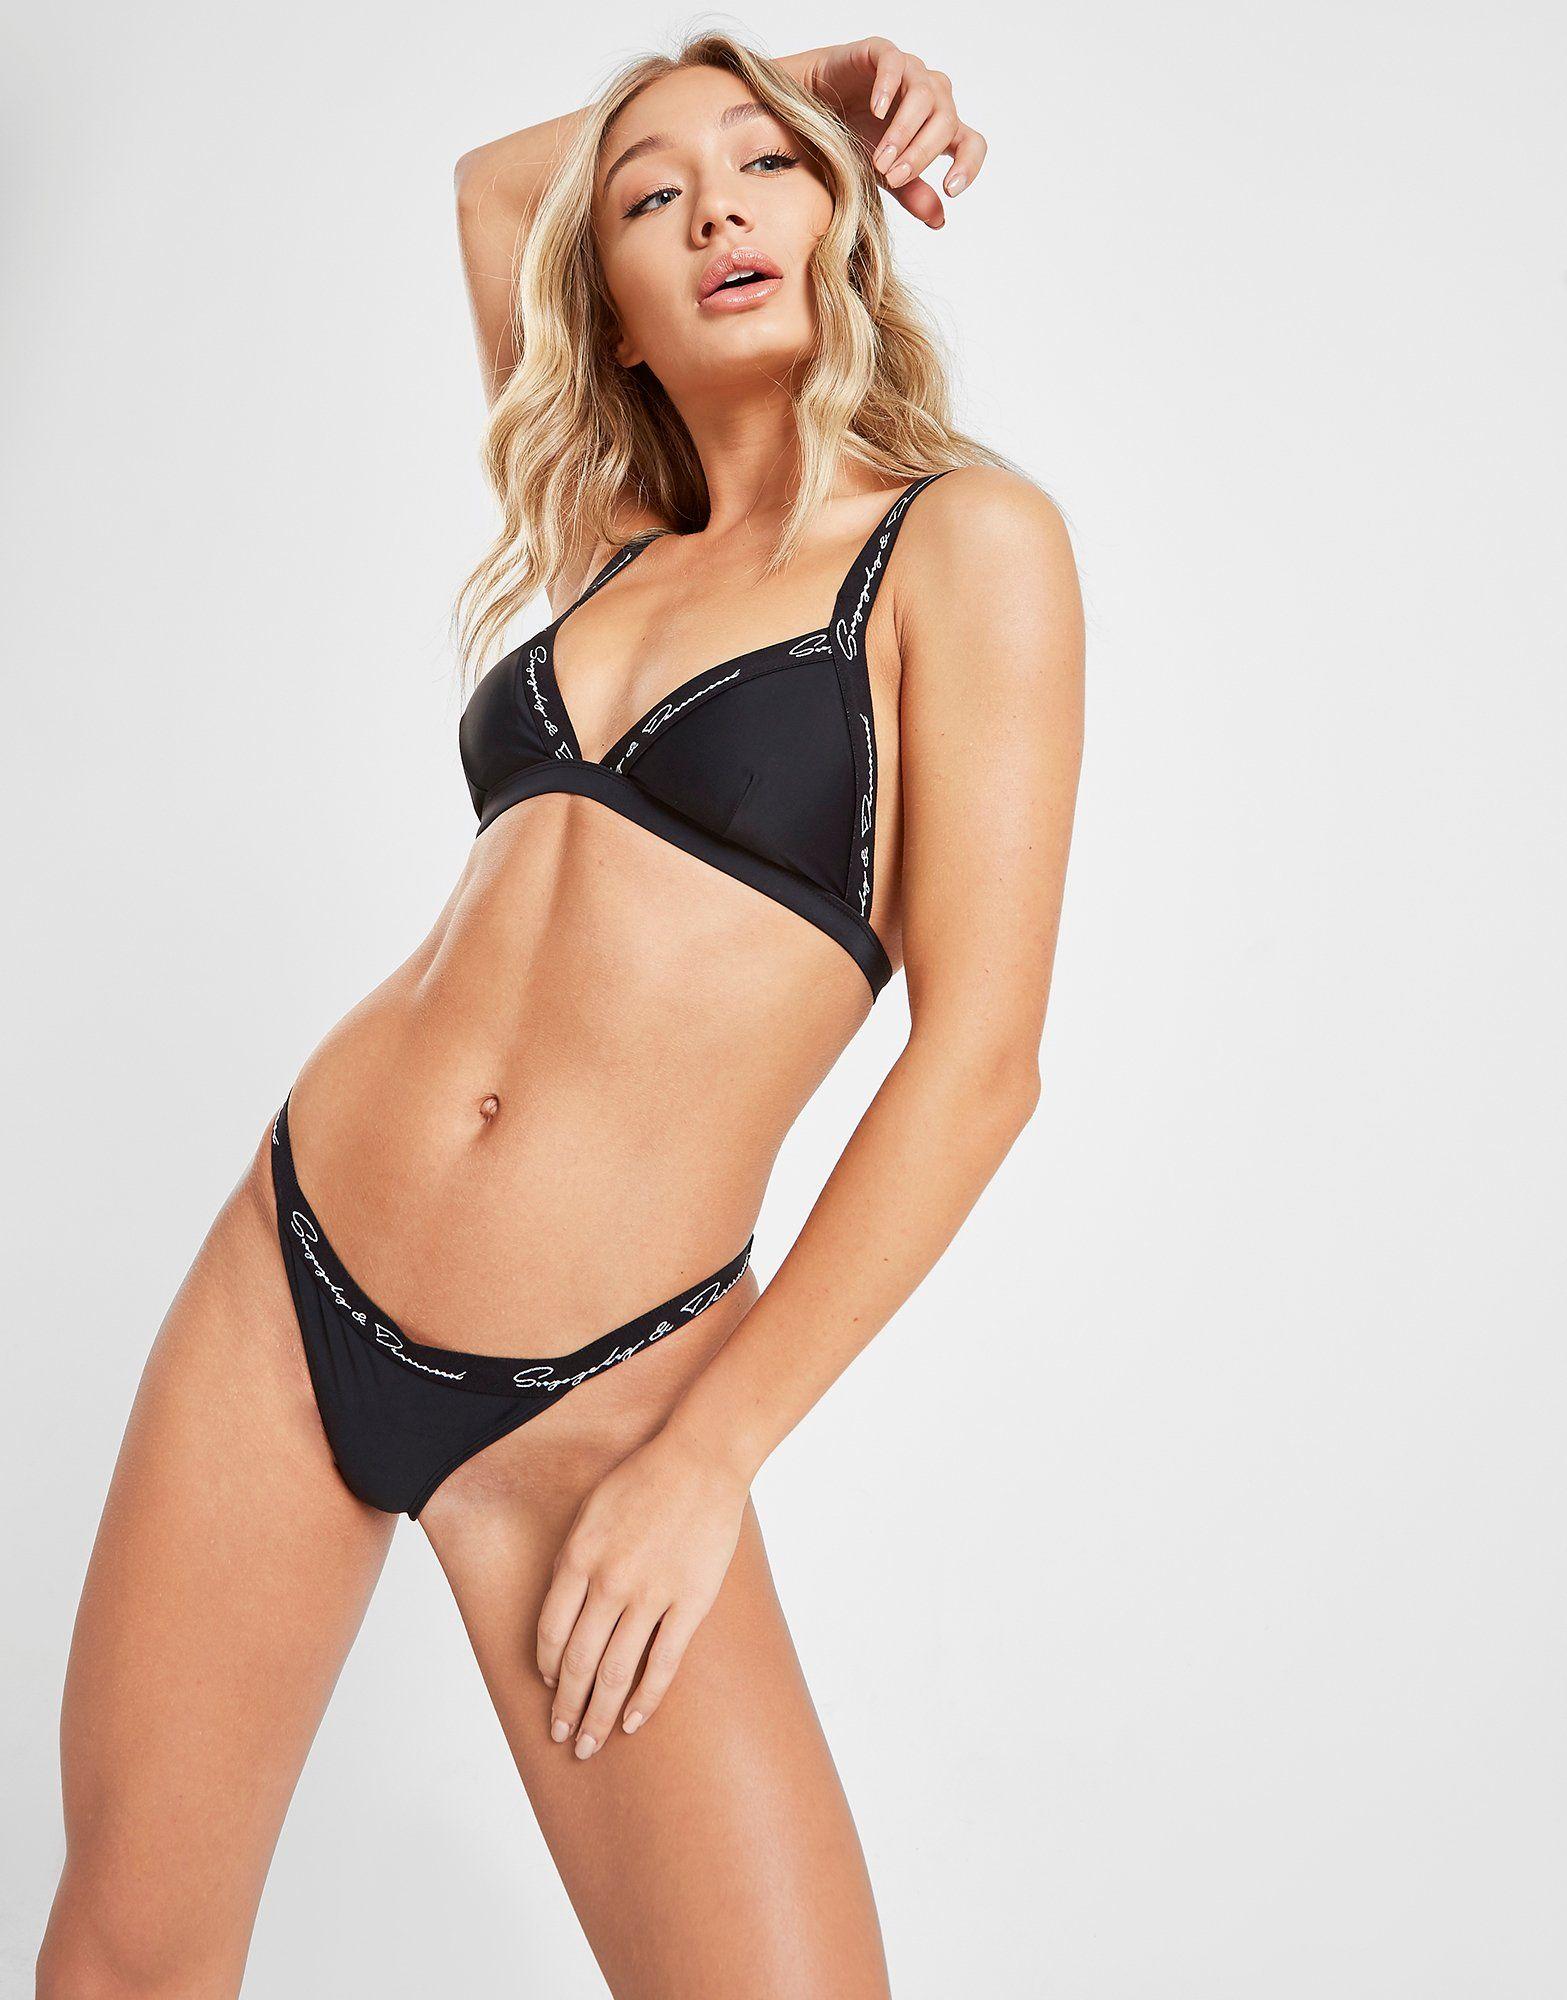 Supply & Demand Strap Bikini Top